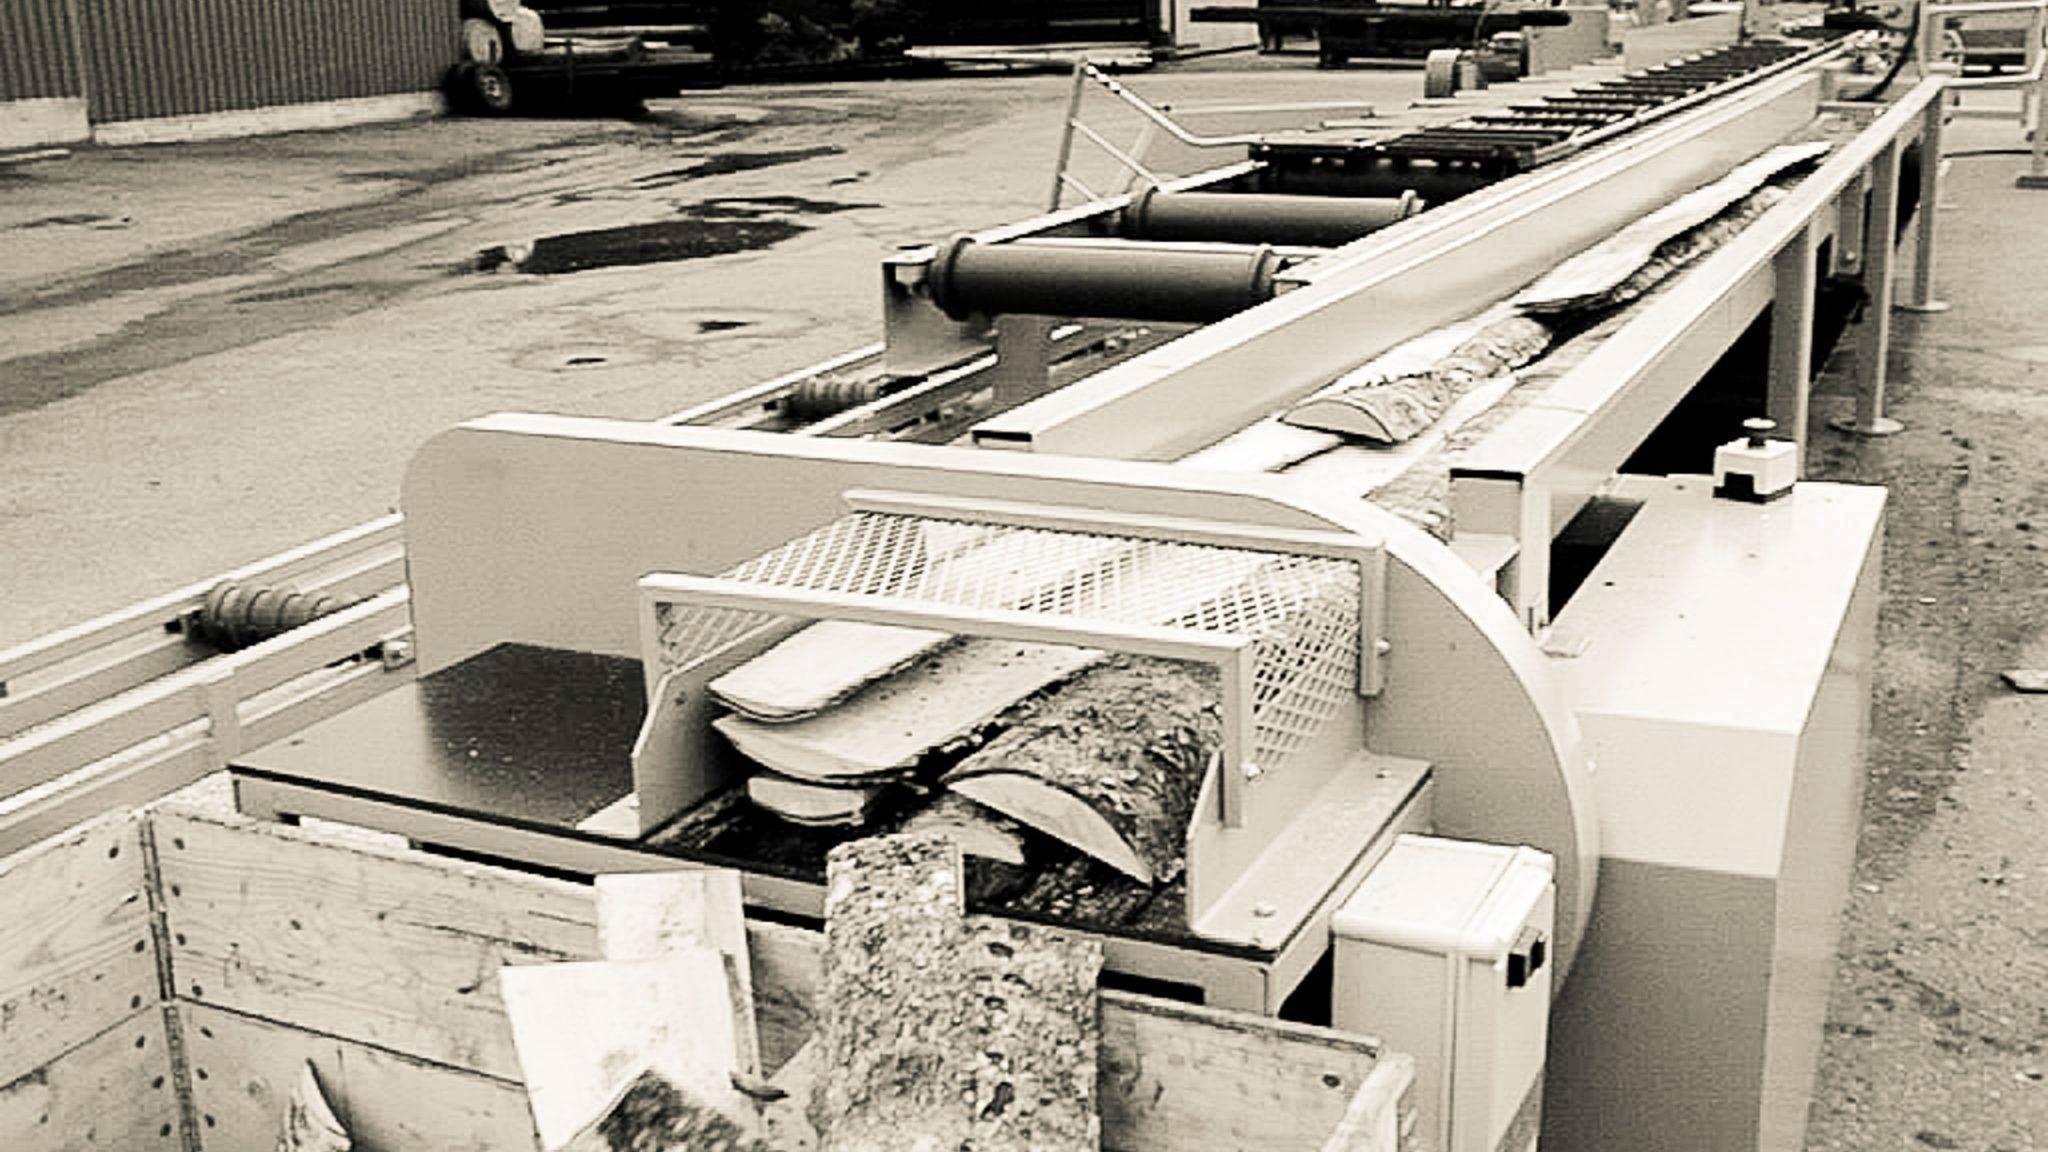 Cross-cut saw for slabs